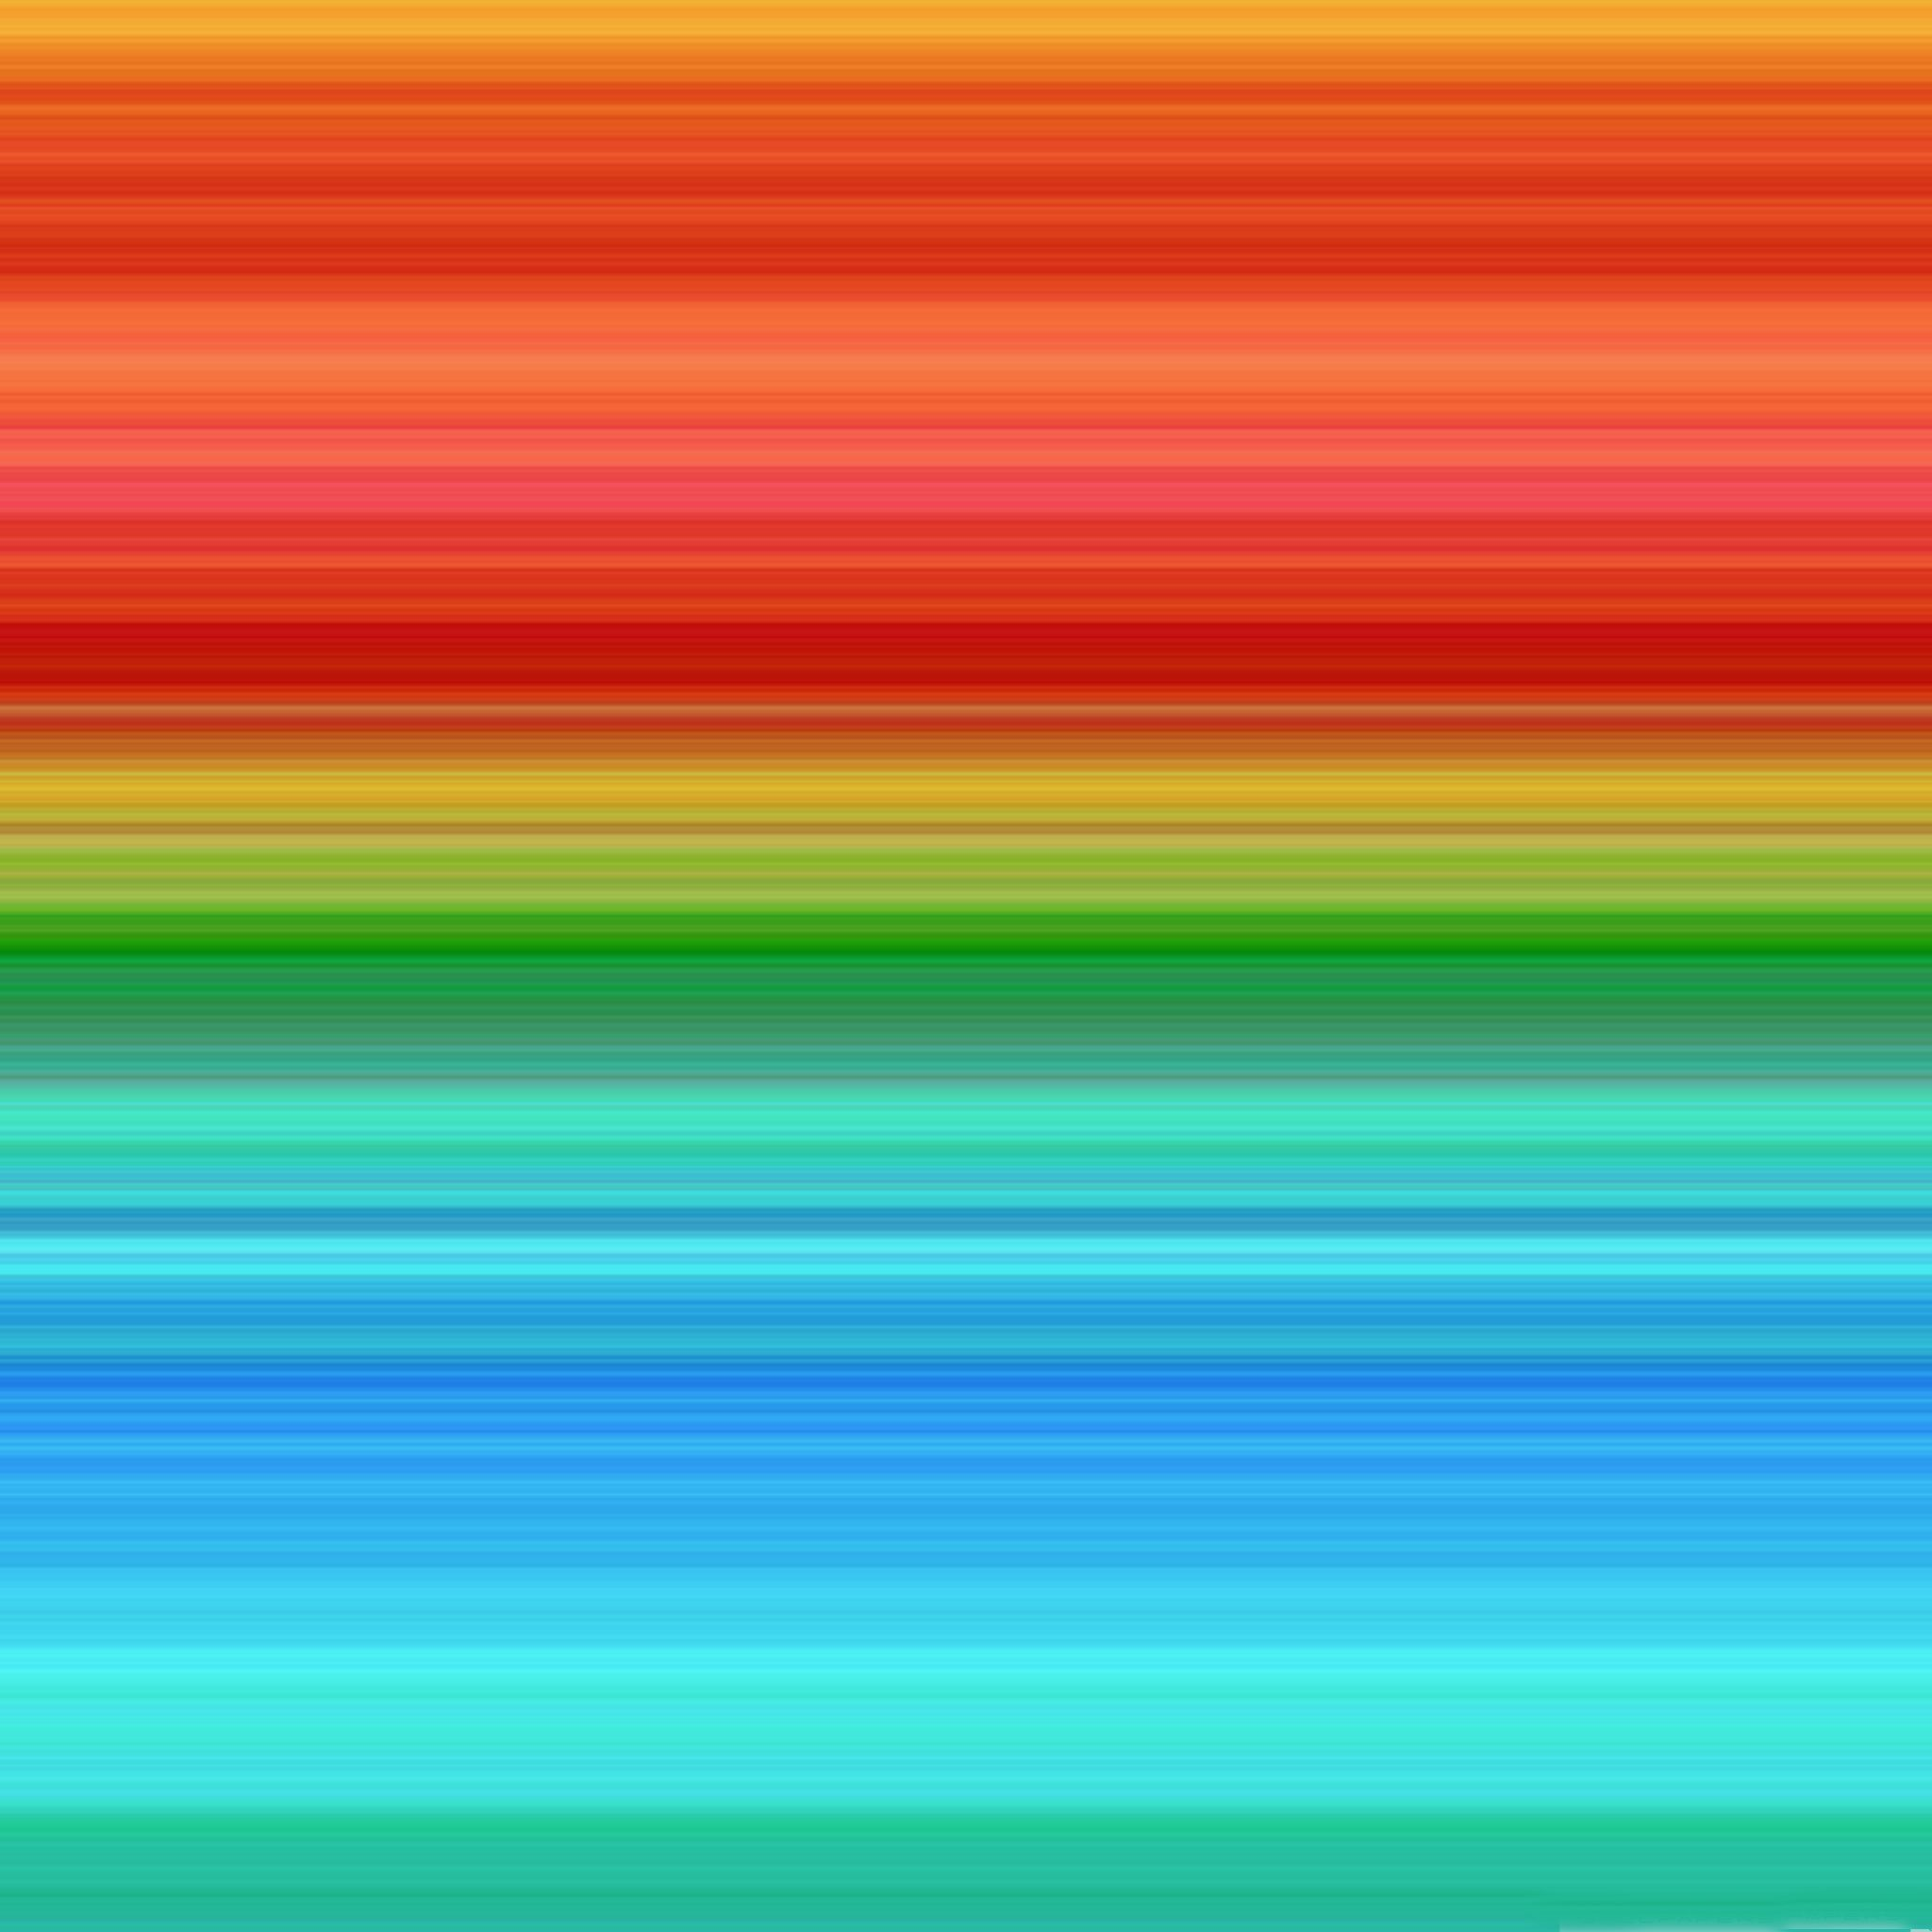 Rainbow-background-ipad-air-wallpaper-ilikewallpaper_com.jpg 2,048×2,048 píxeles